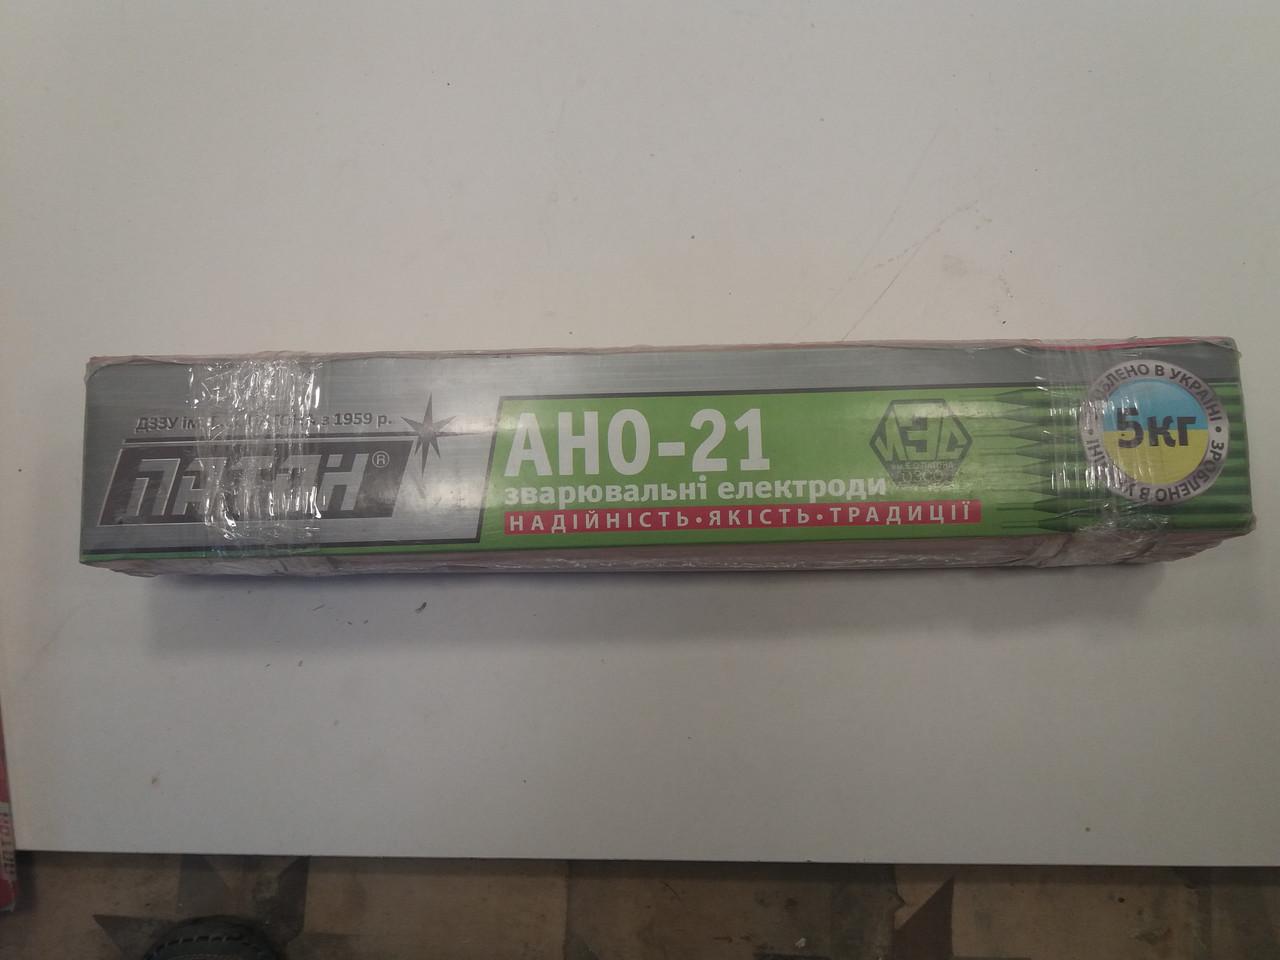 Сварочные электроды Патон АНО-21 5мм 5кг